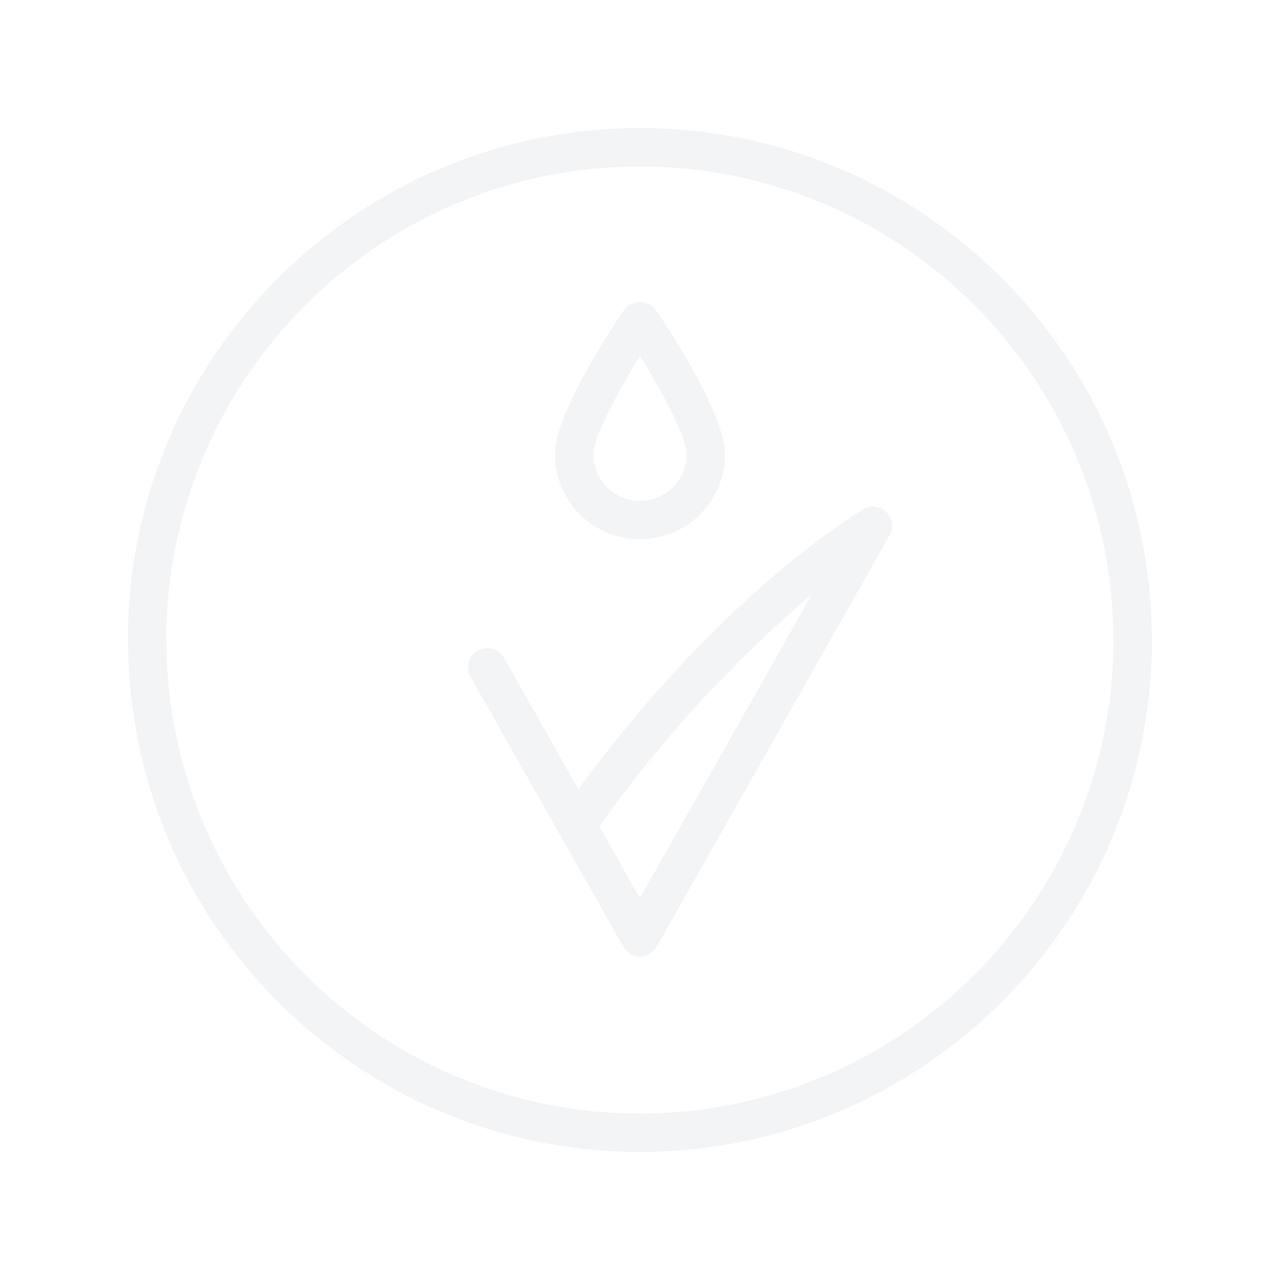 E.L.F. Waterproof Lengthening & Volumizing Mascara Black 9ml